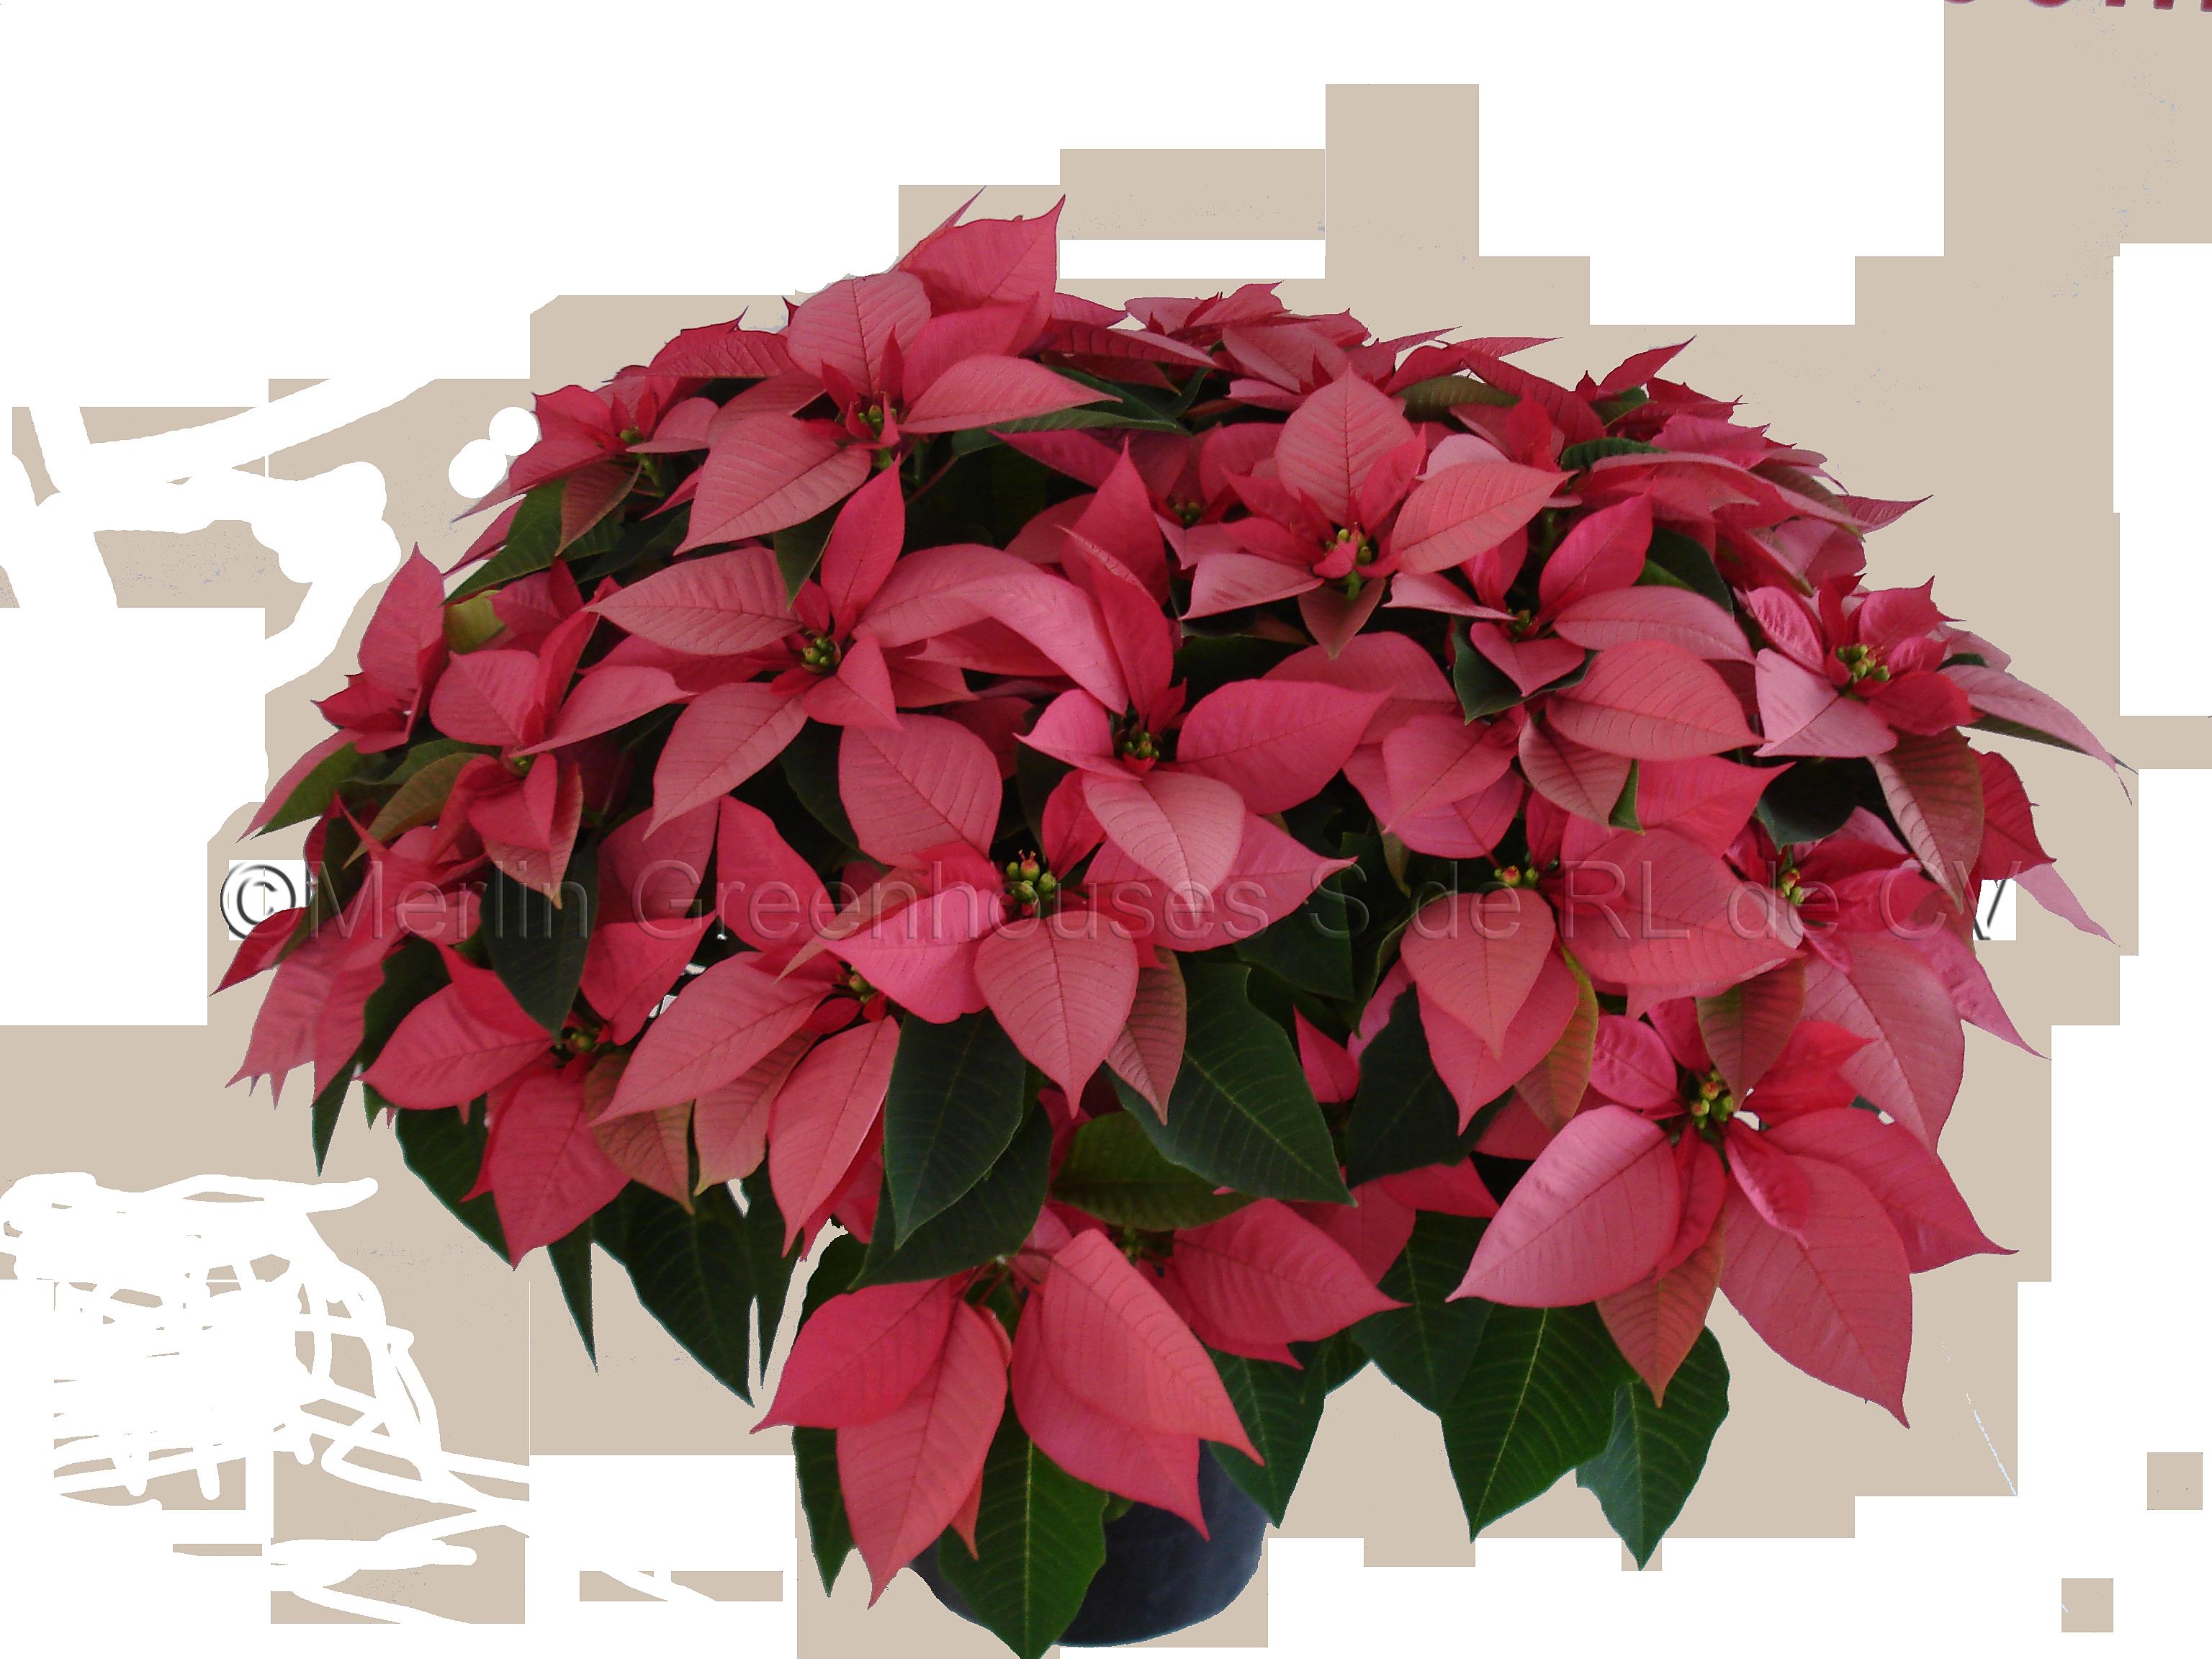 Flor De Nochebuena Nochebuenas Impresi 243 N Lipstick